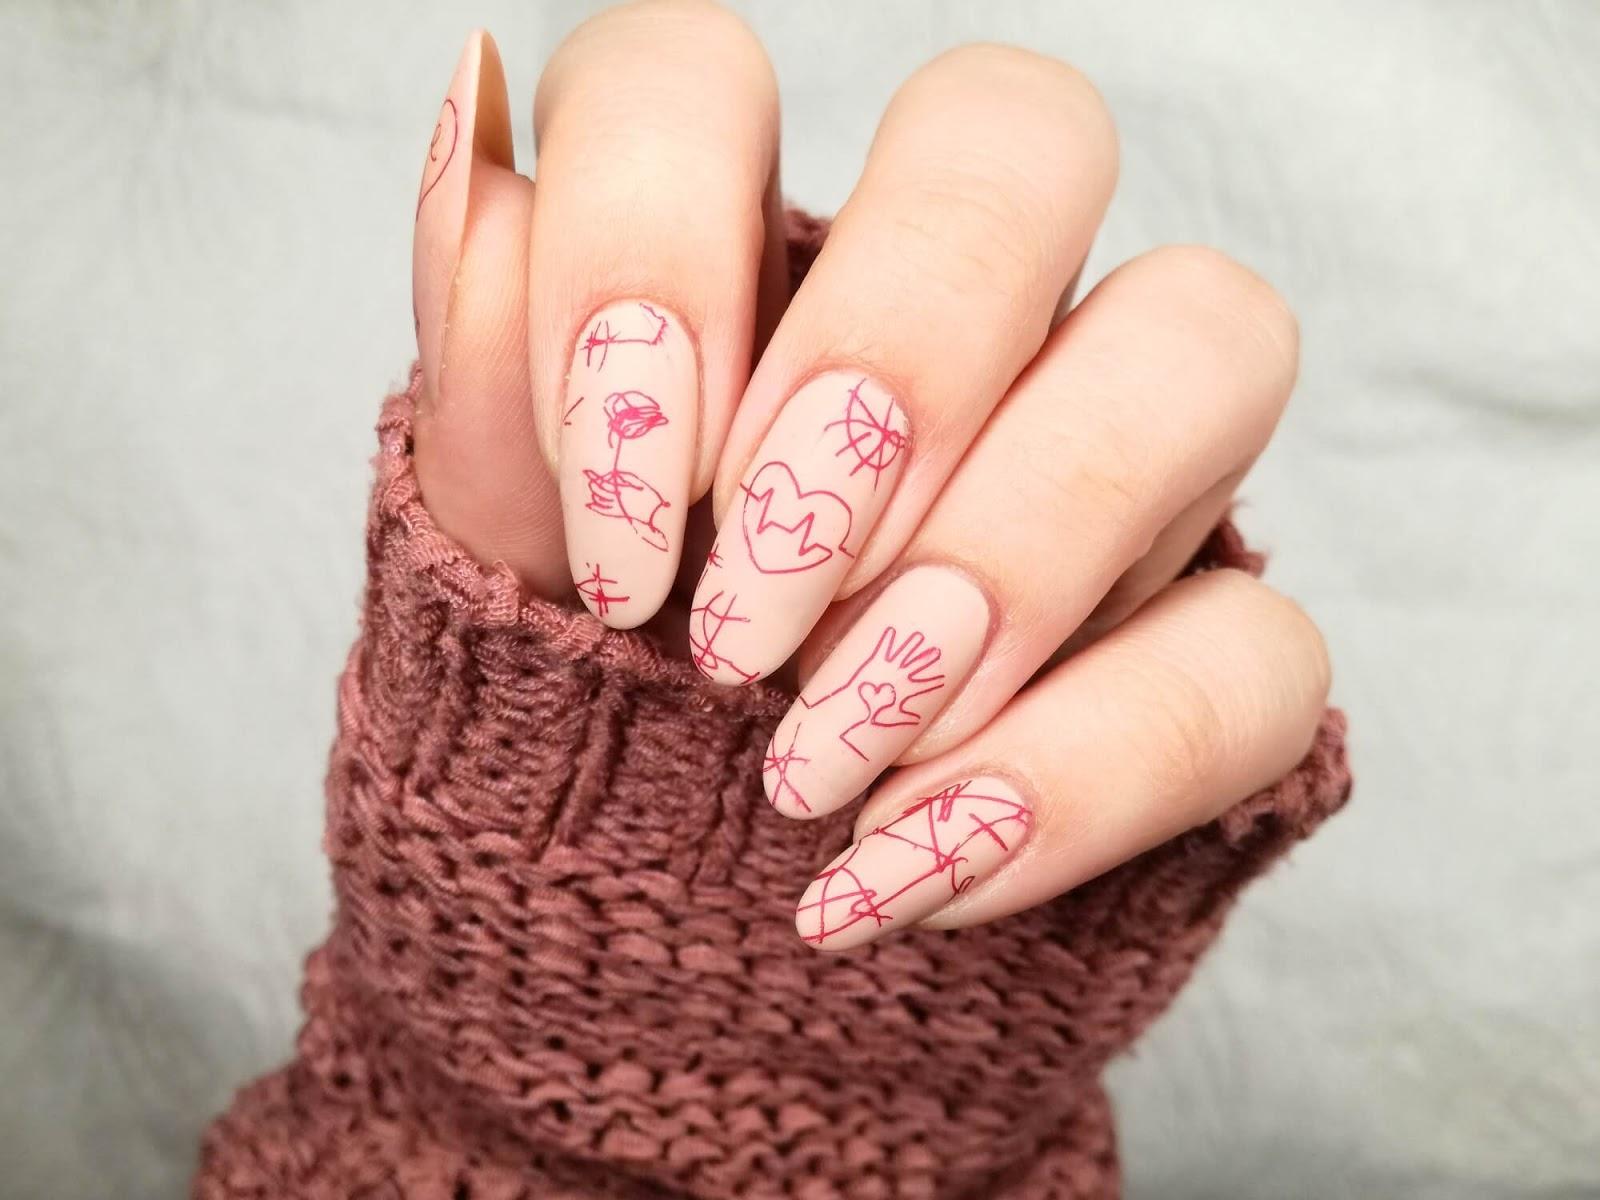 Cieliste paznokcie - stonowane zdobienie z różem